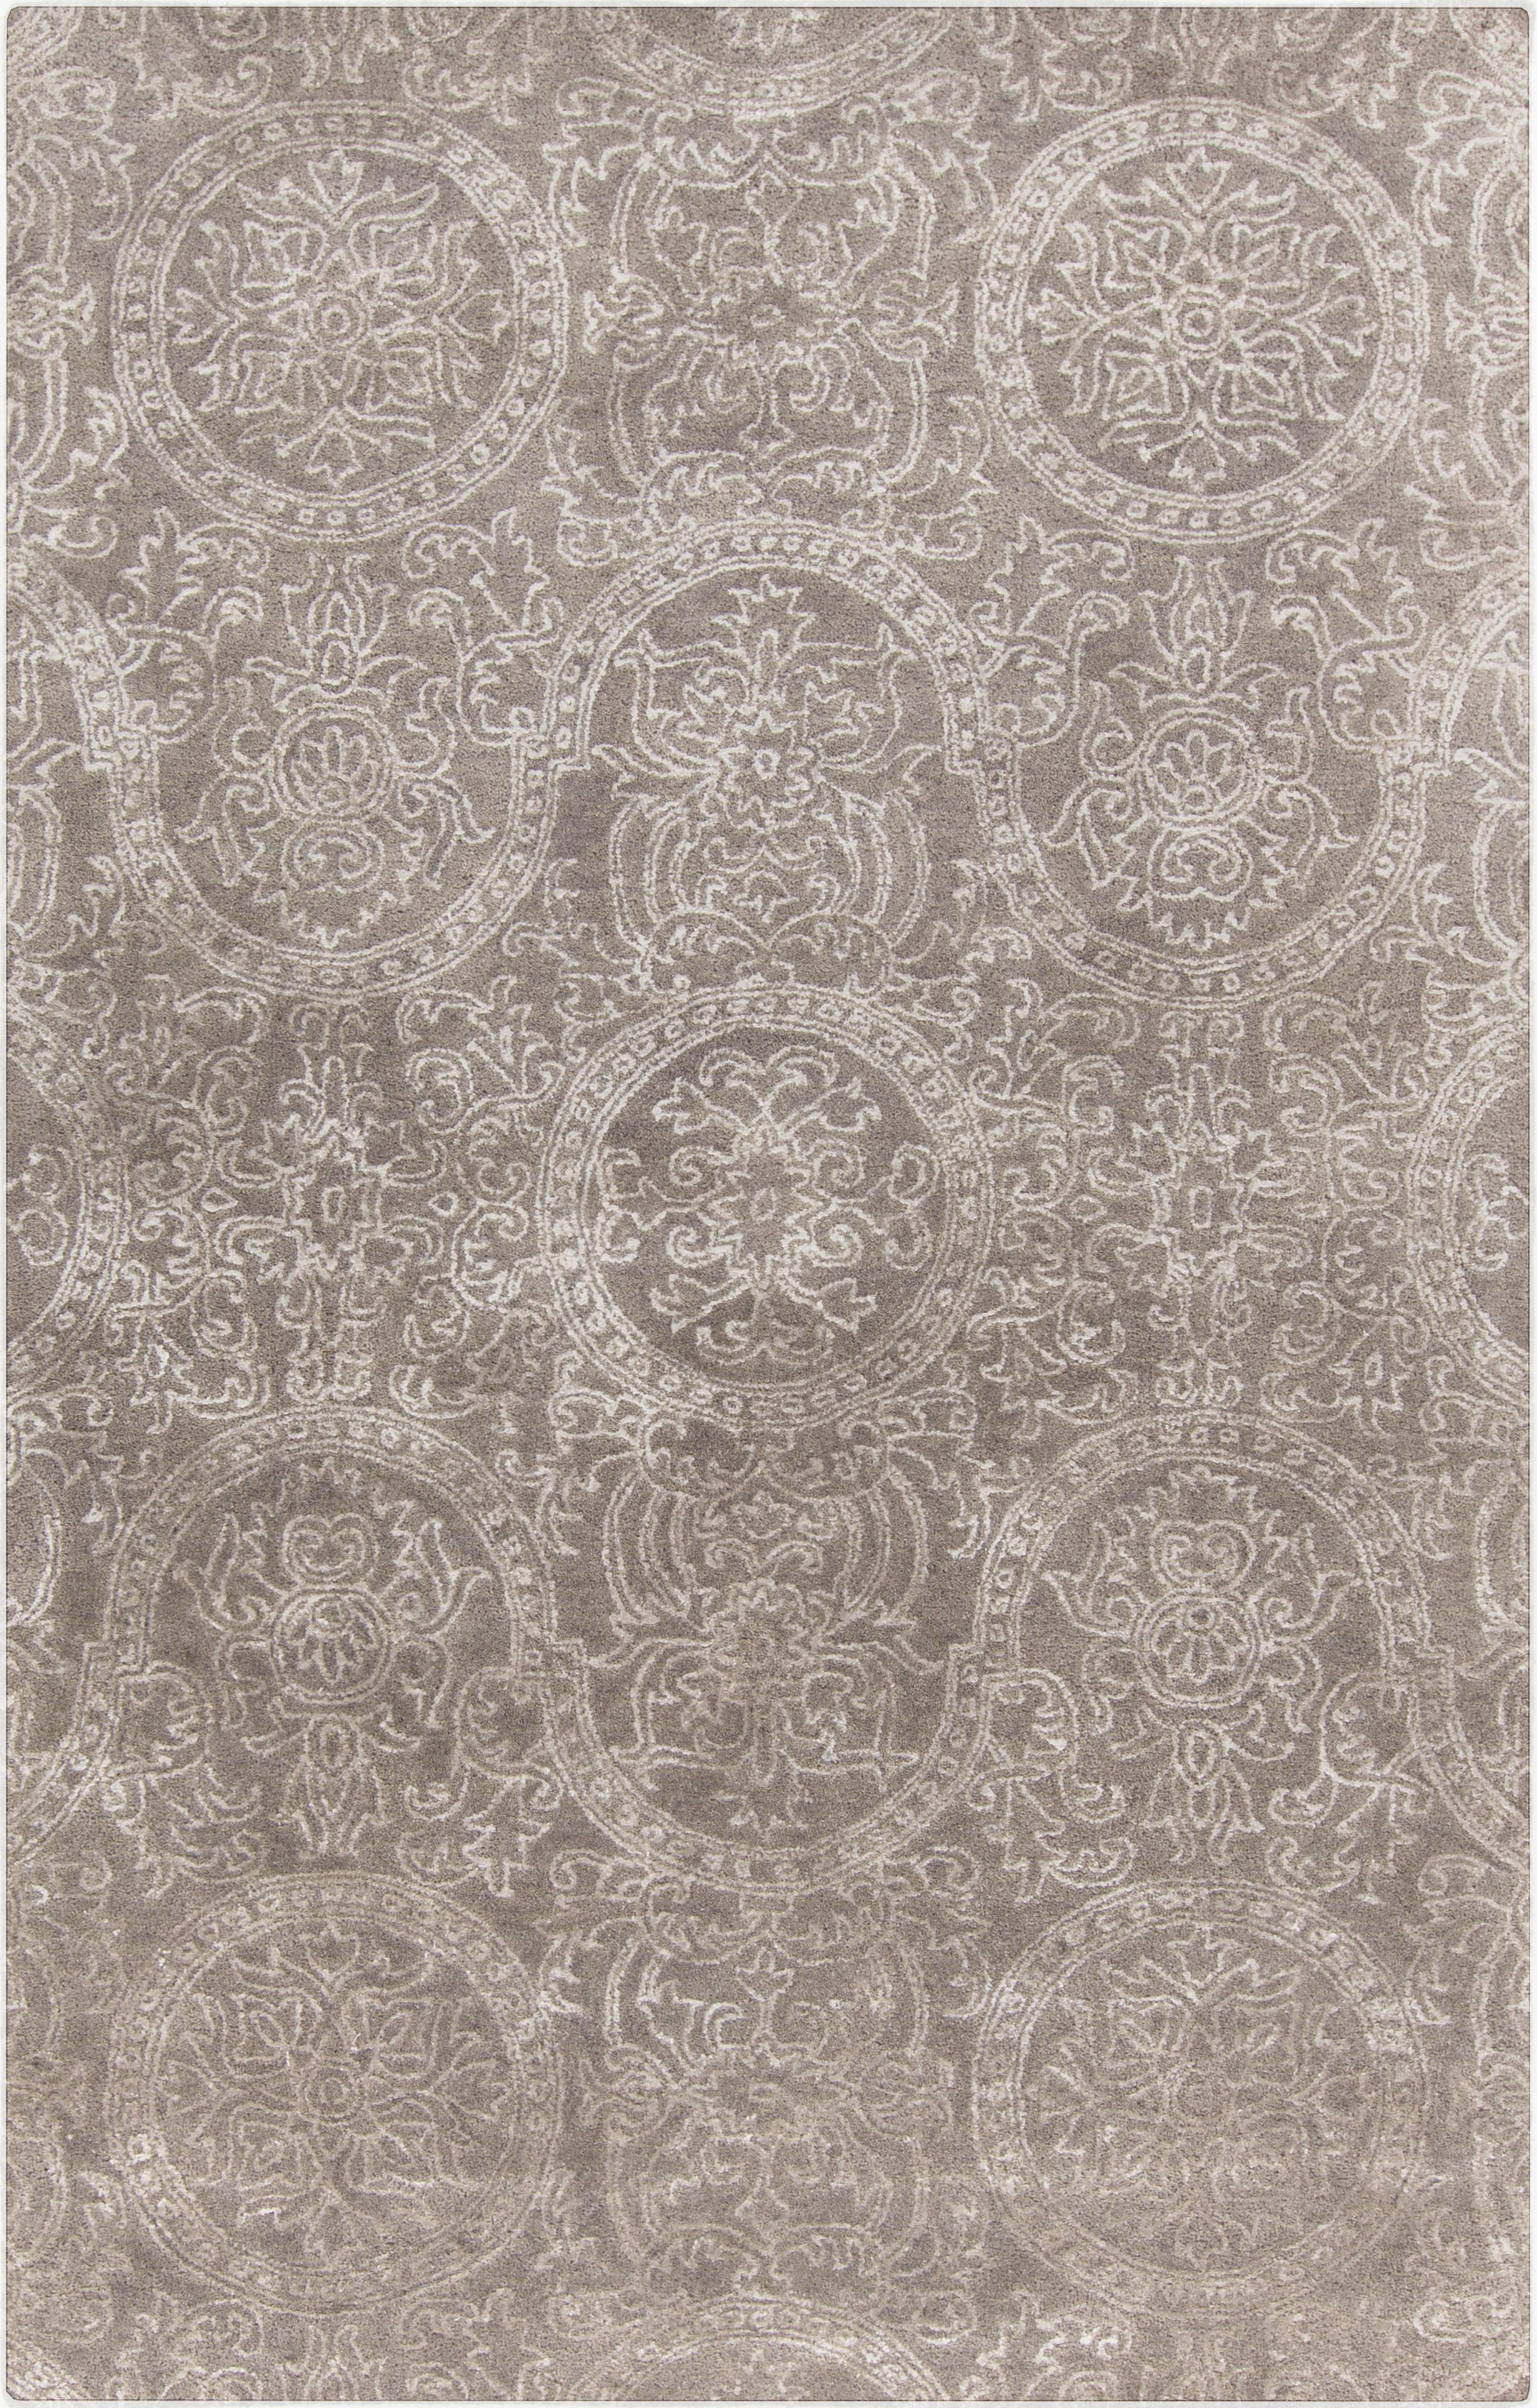 Surya Rugs Henna 2' x 3' - Item Number: HEN1000-23